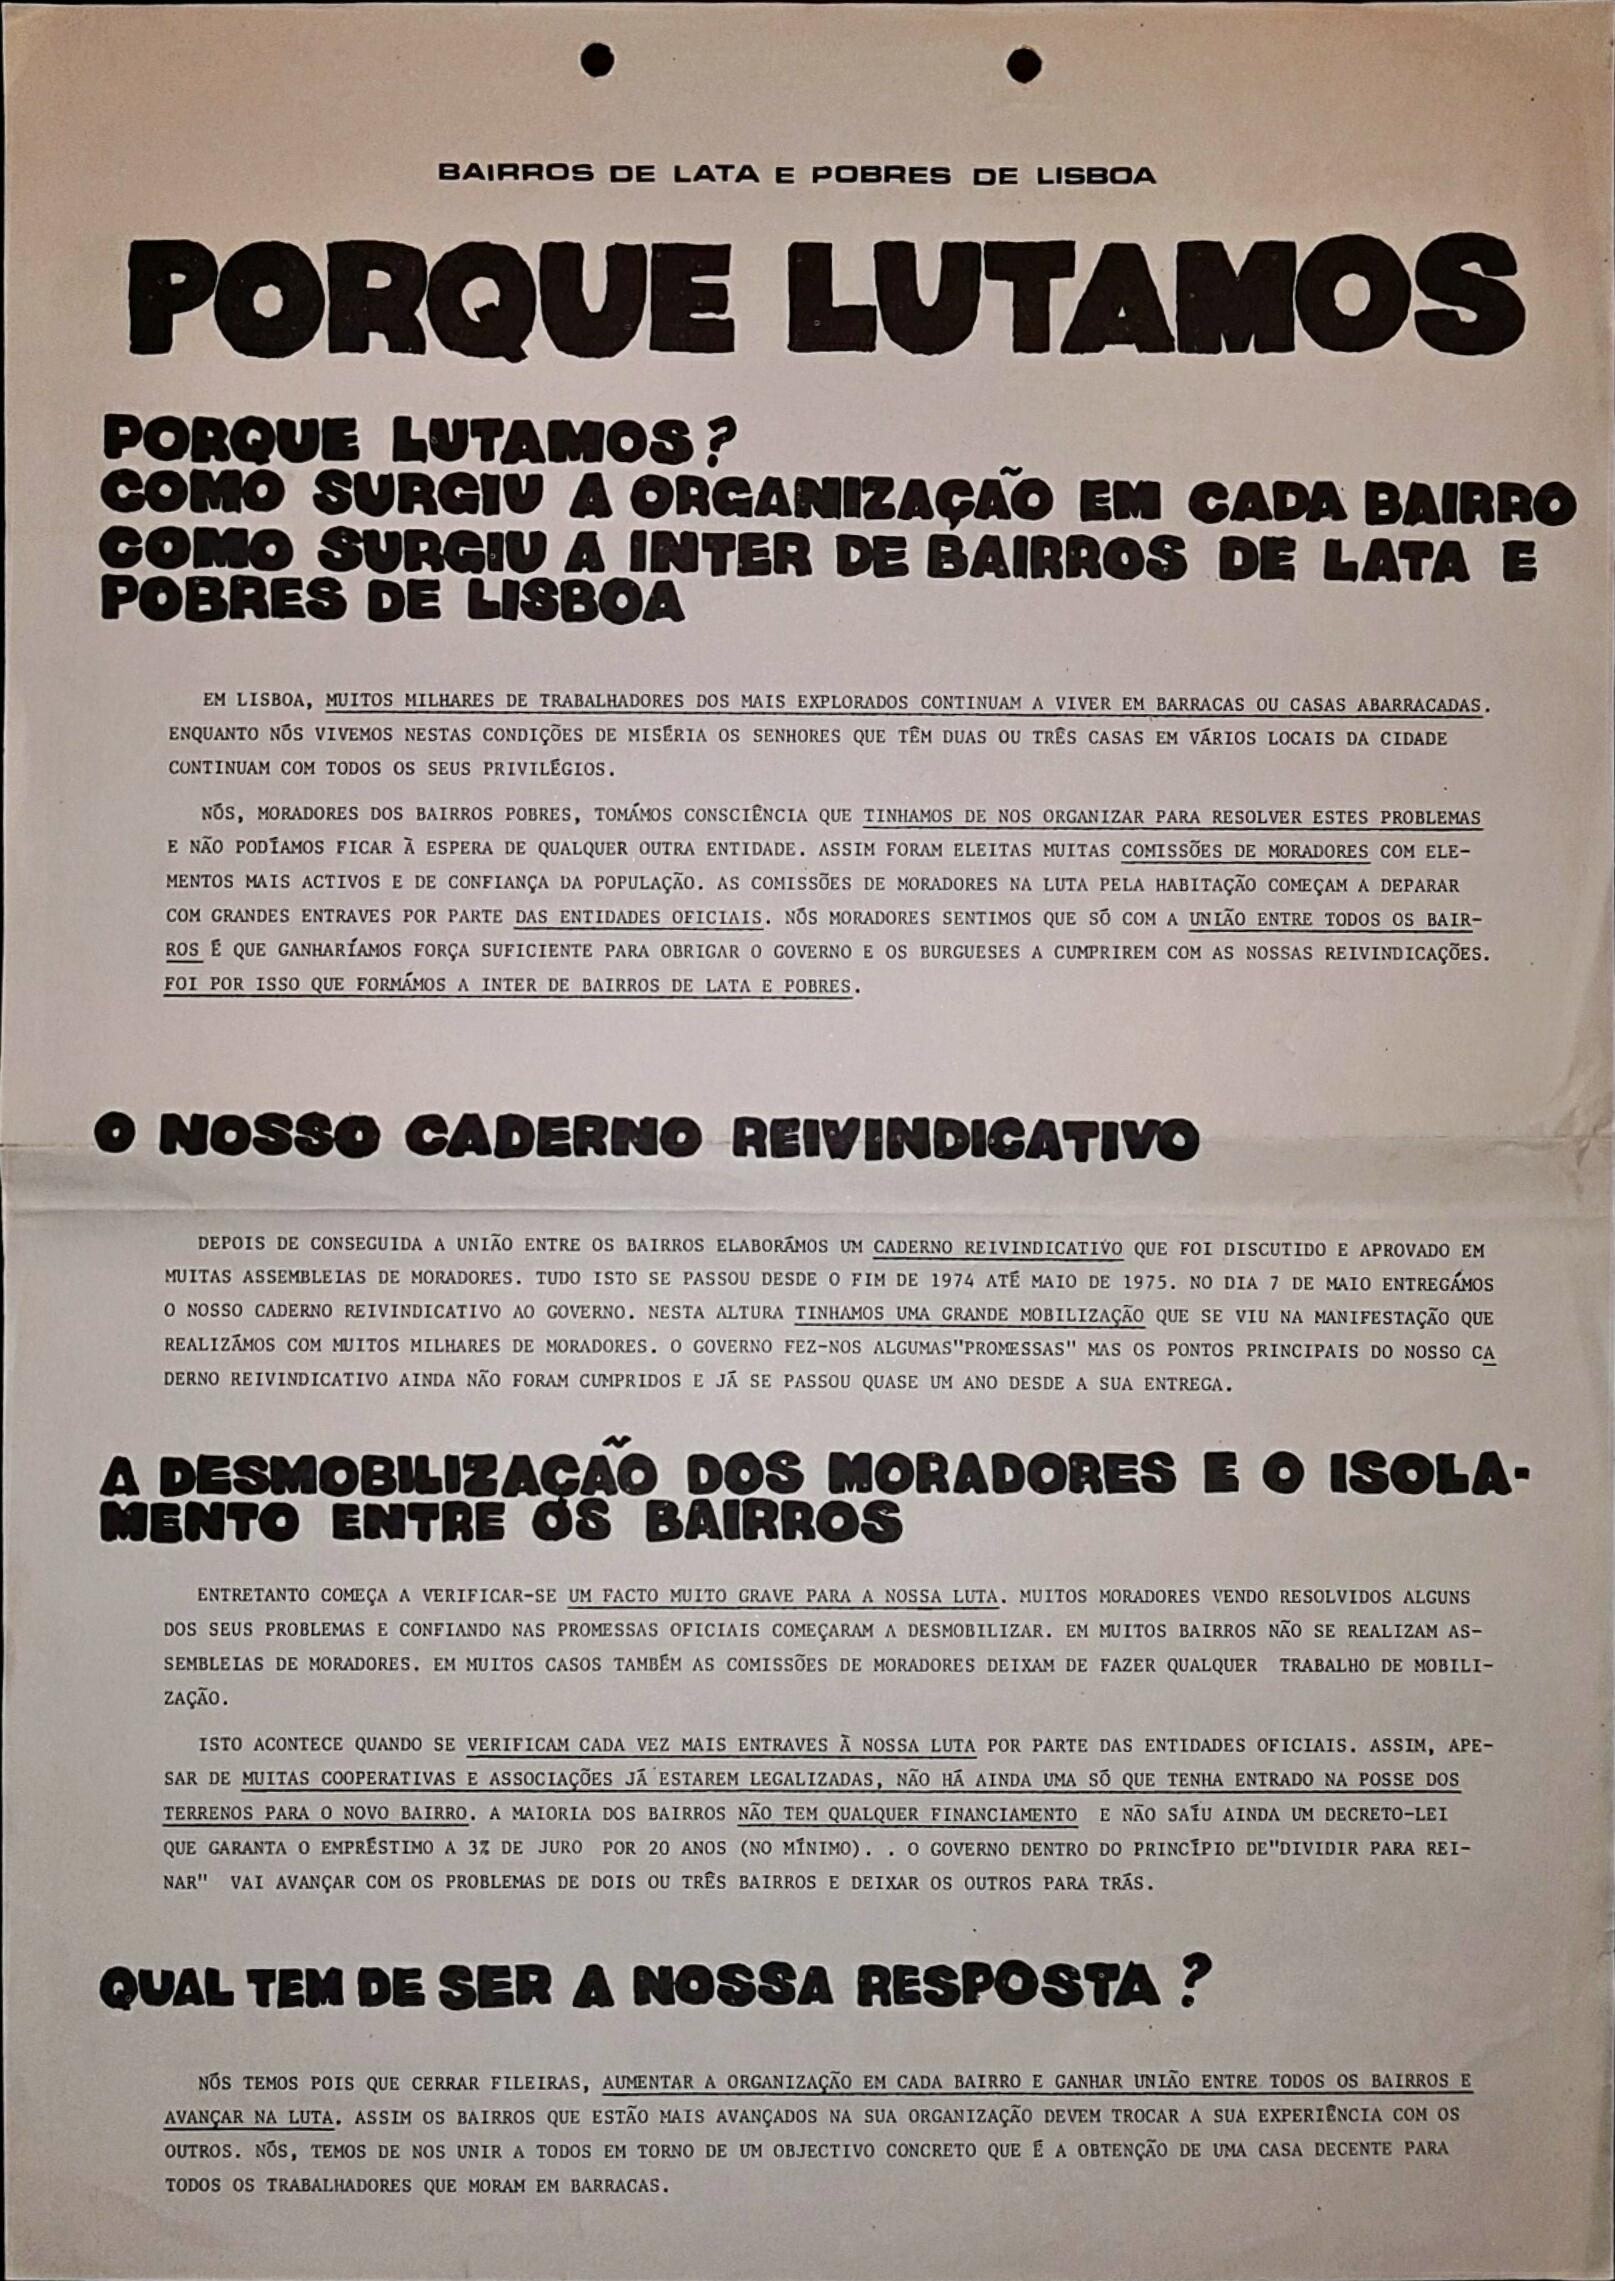 Intercomissoes_Bairros_Lata_0007